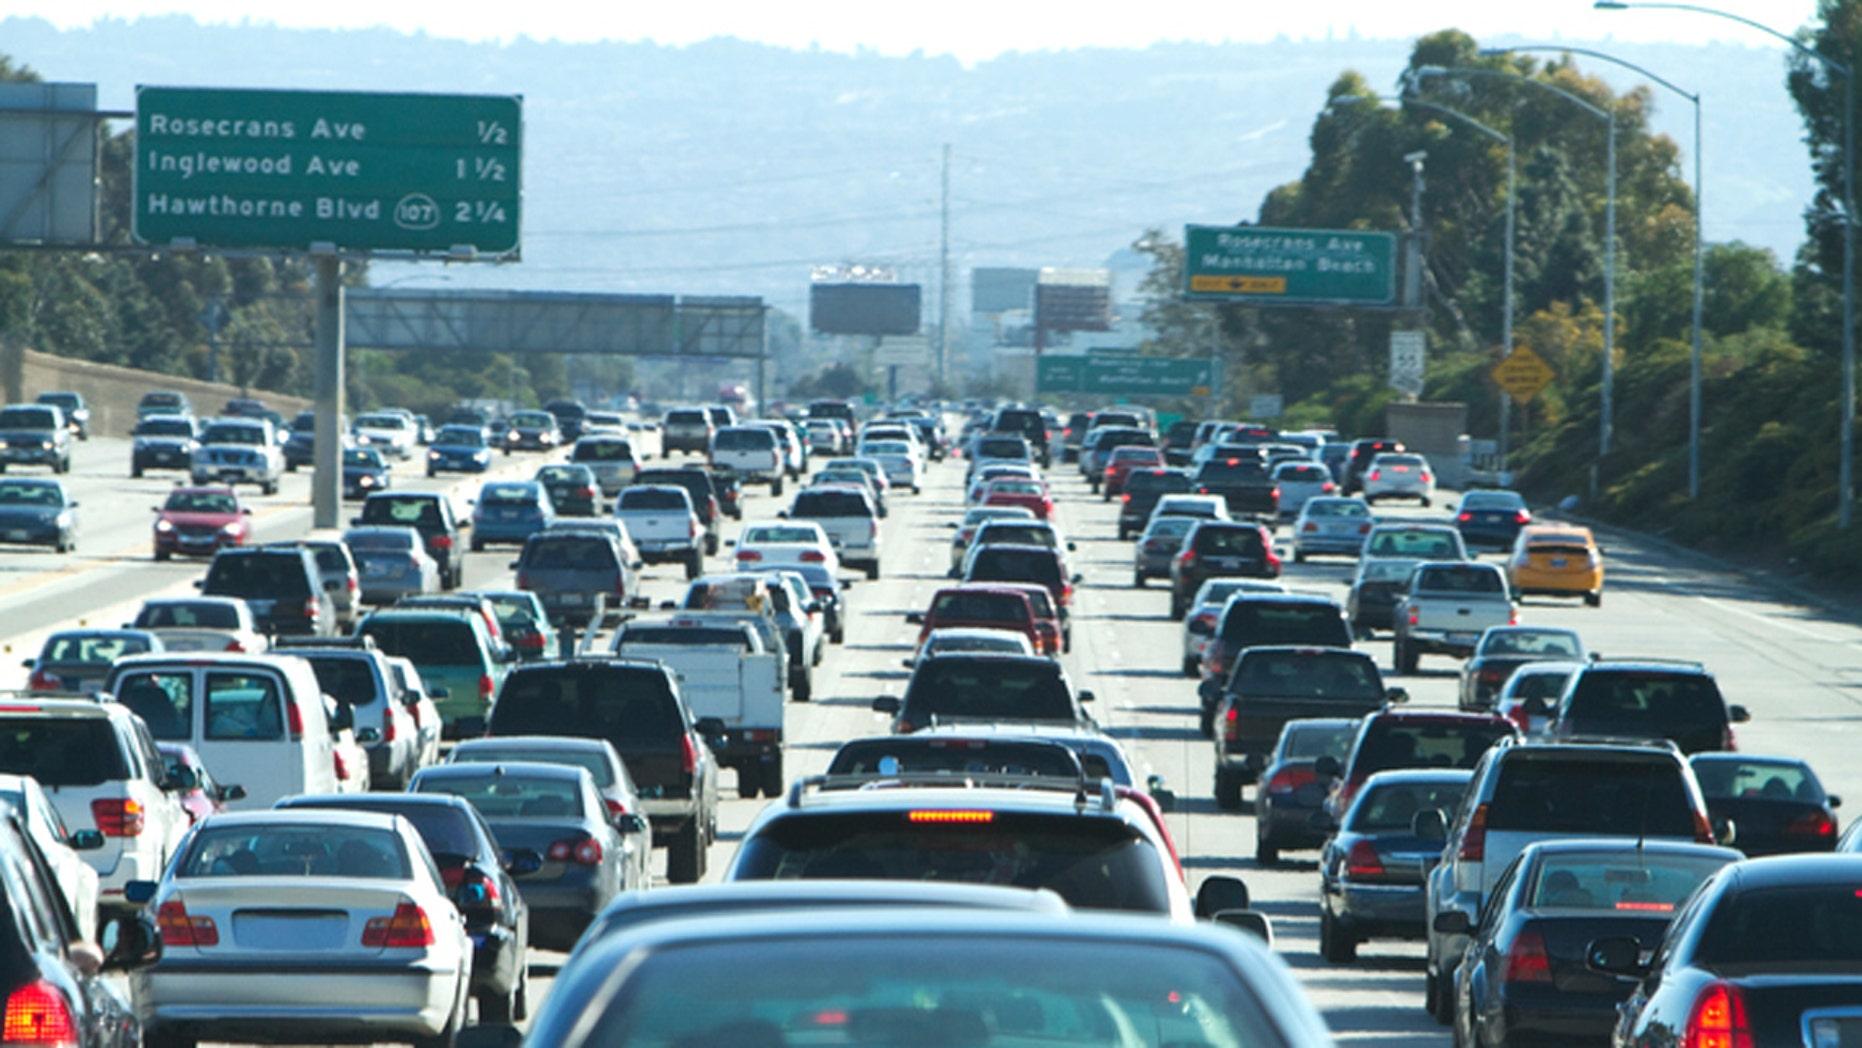 A traffic jam on the 405 freeway in LA California.